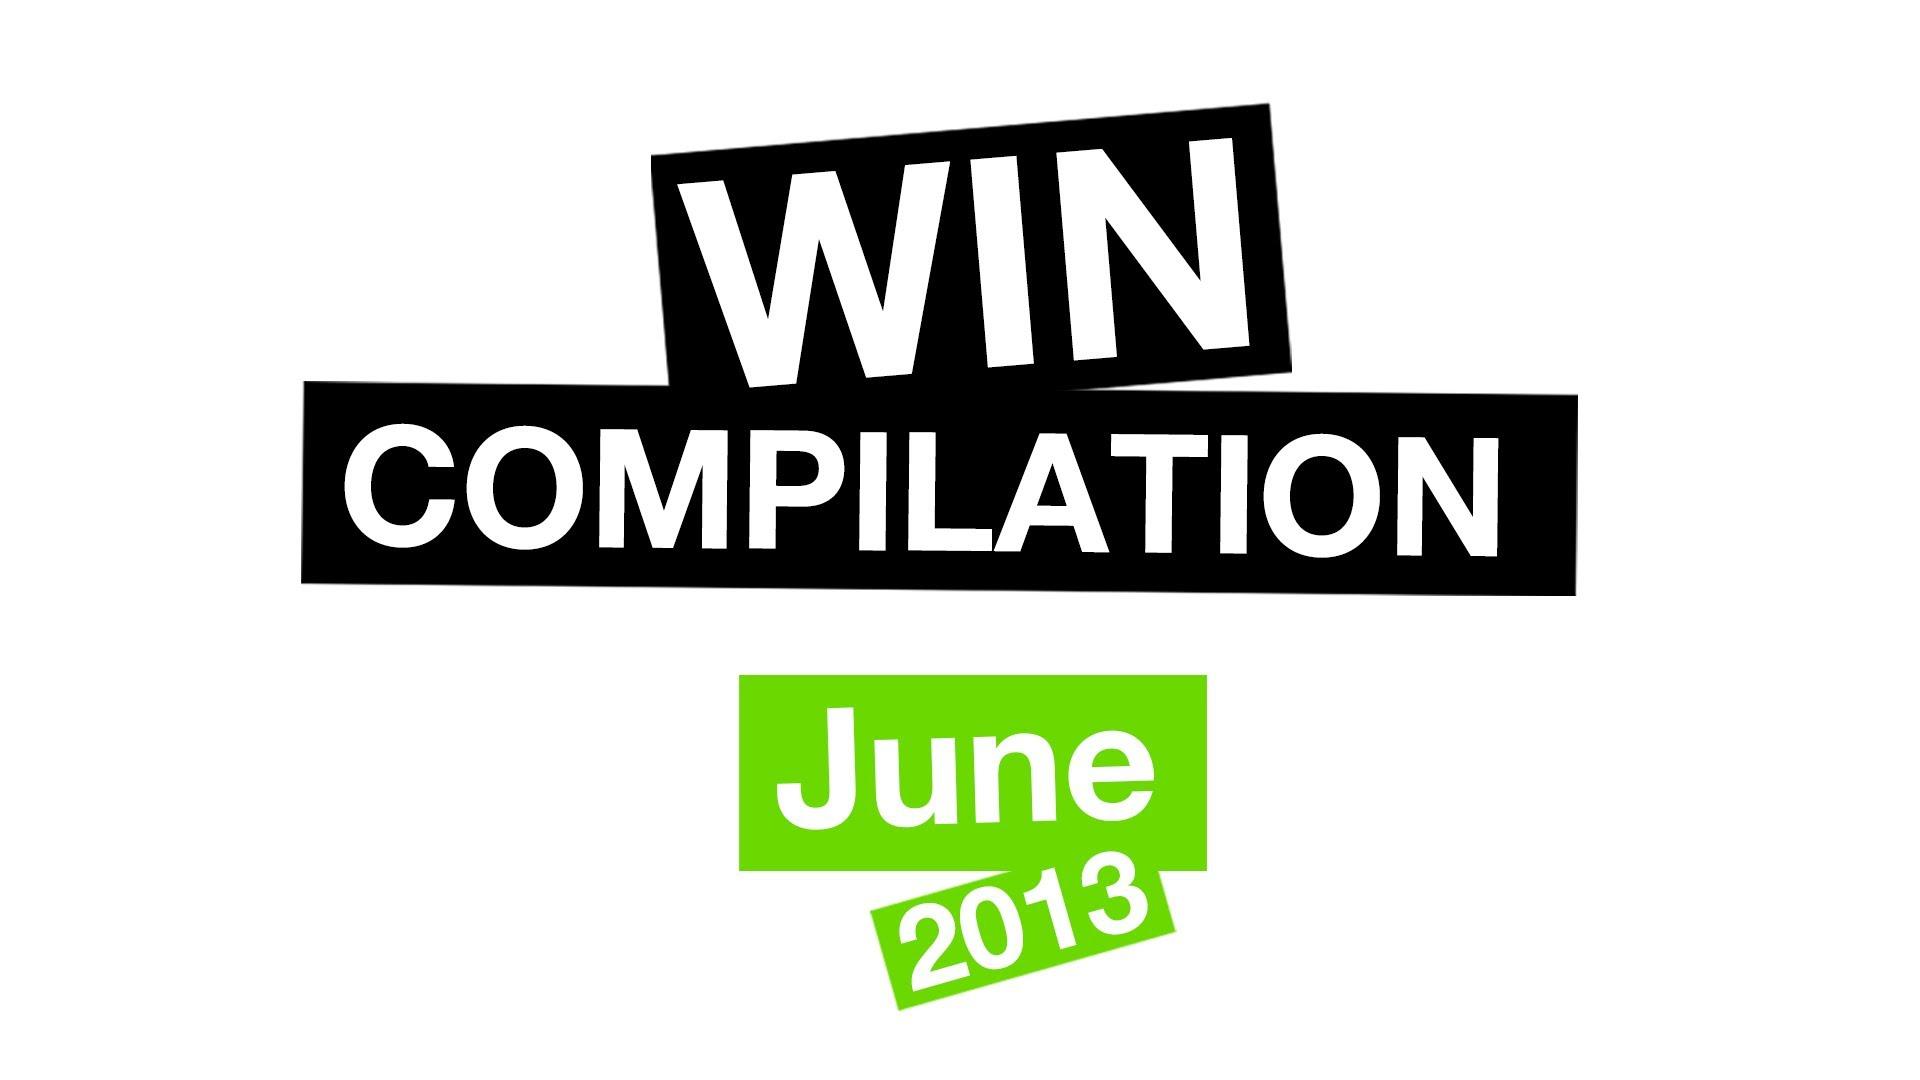 WIN Compilation June 2013